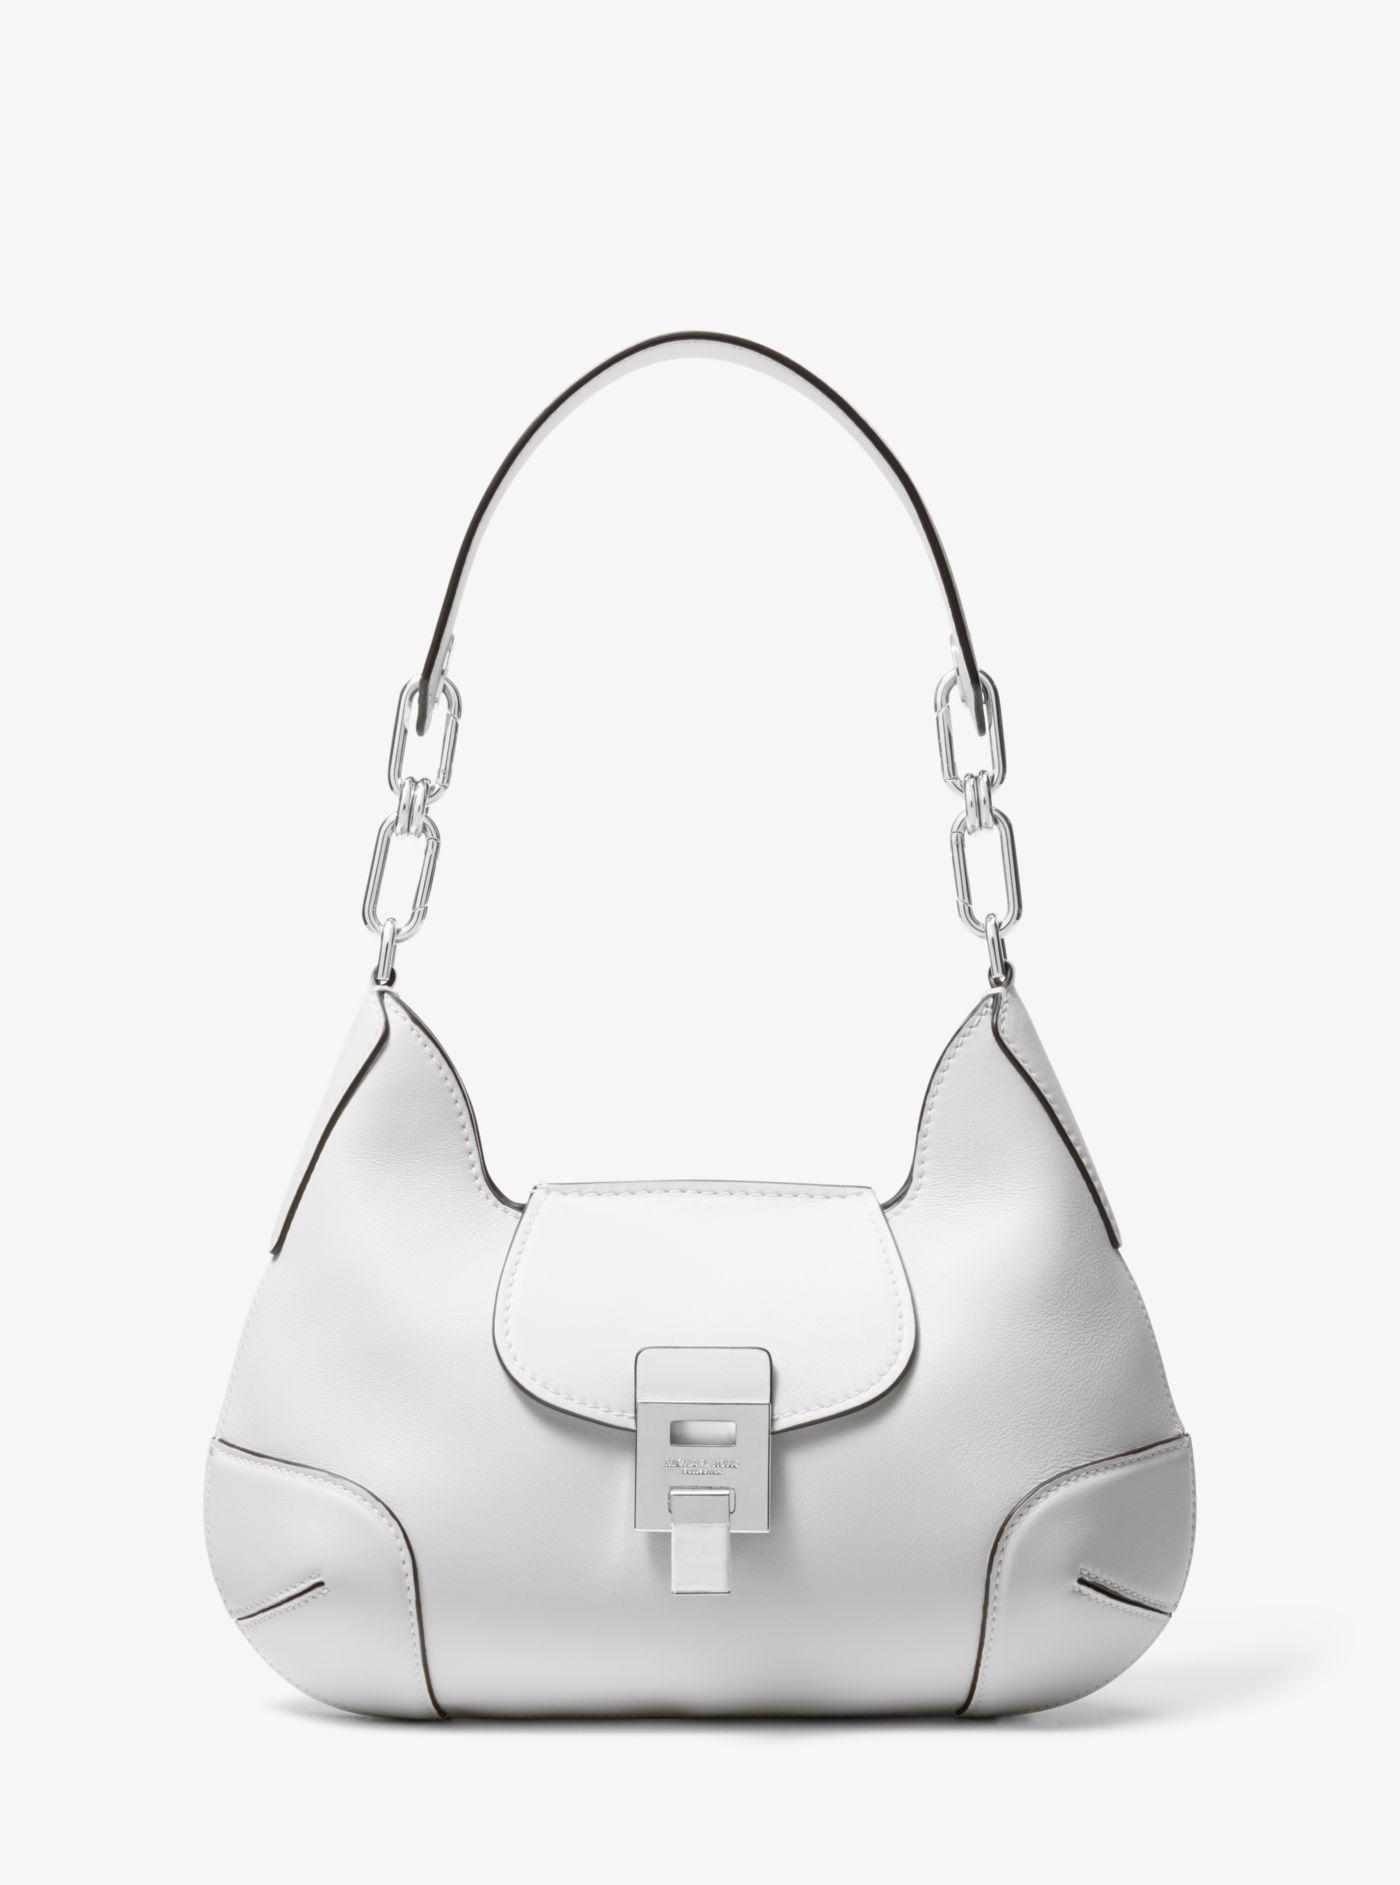 b32bd8cd5230 Lyst - Michael Kors Bancroft Medium Calf Leather Shoulder Bag in White